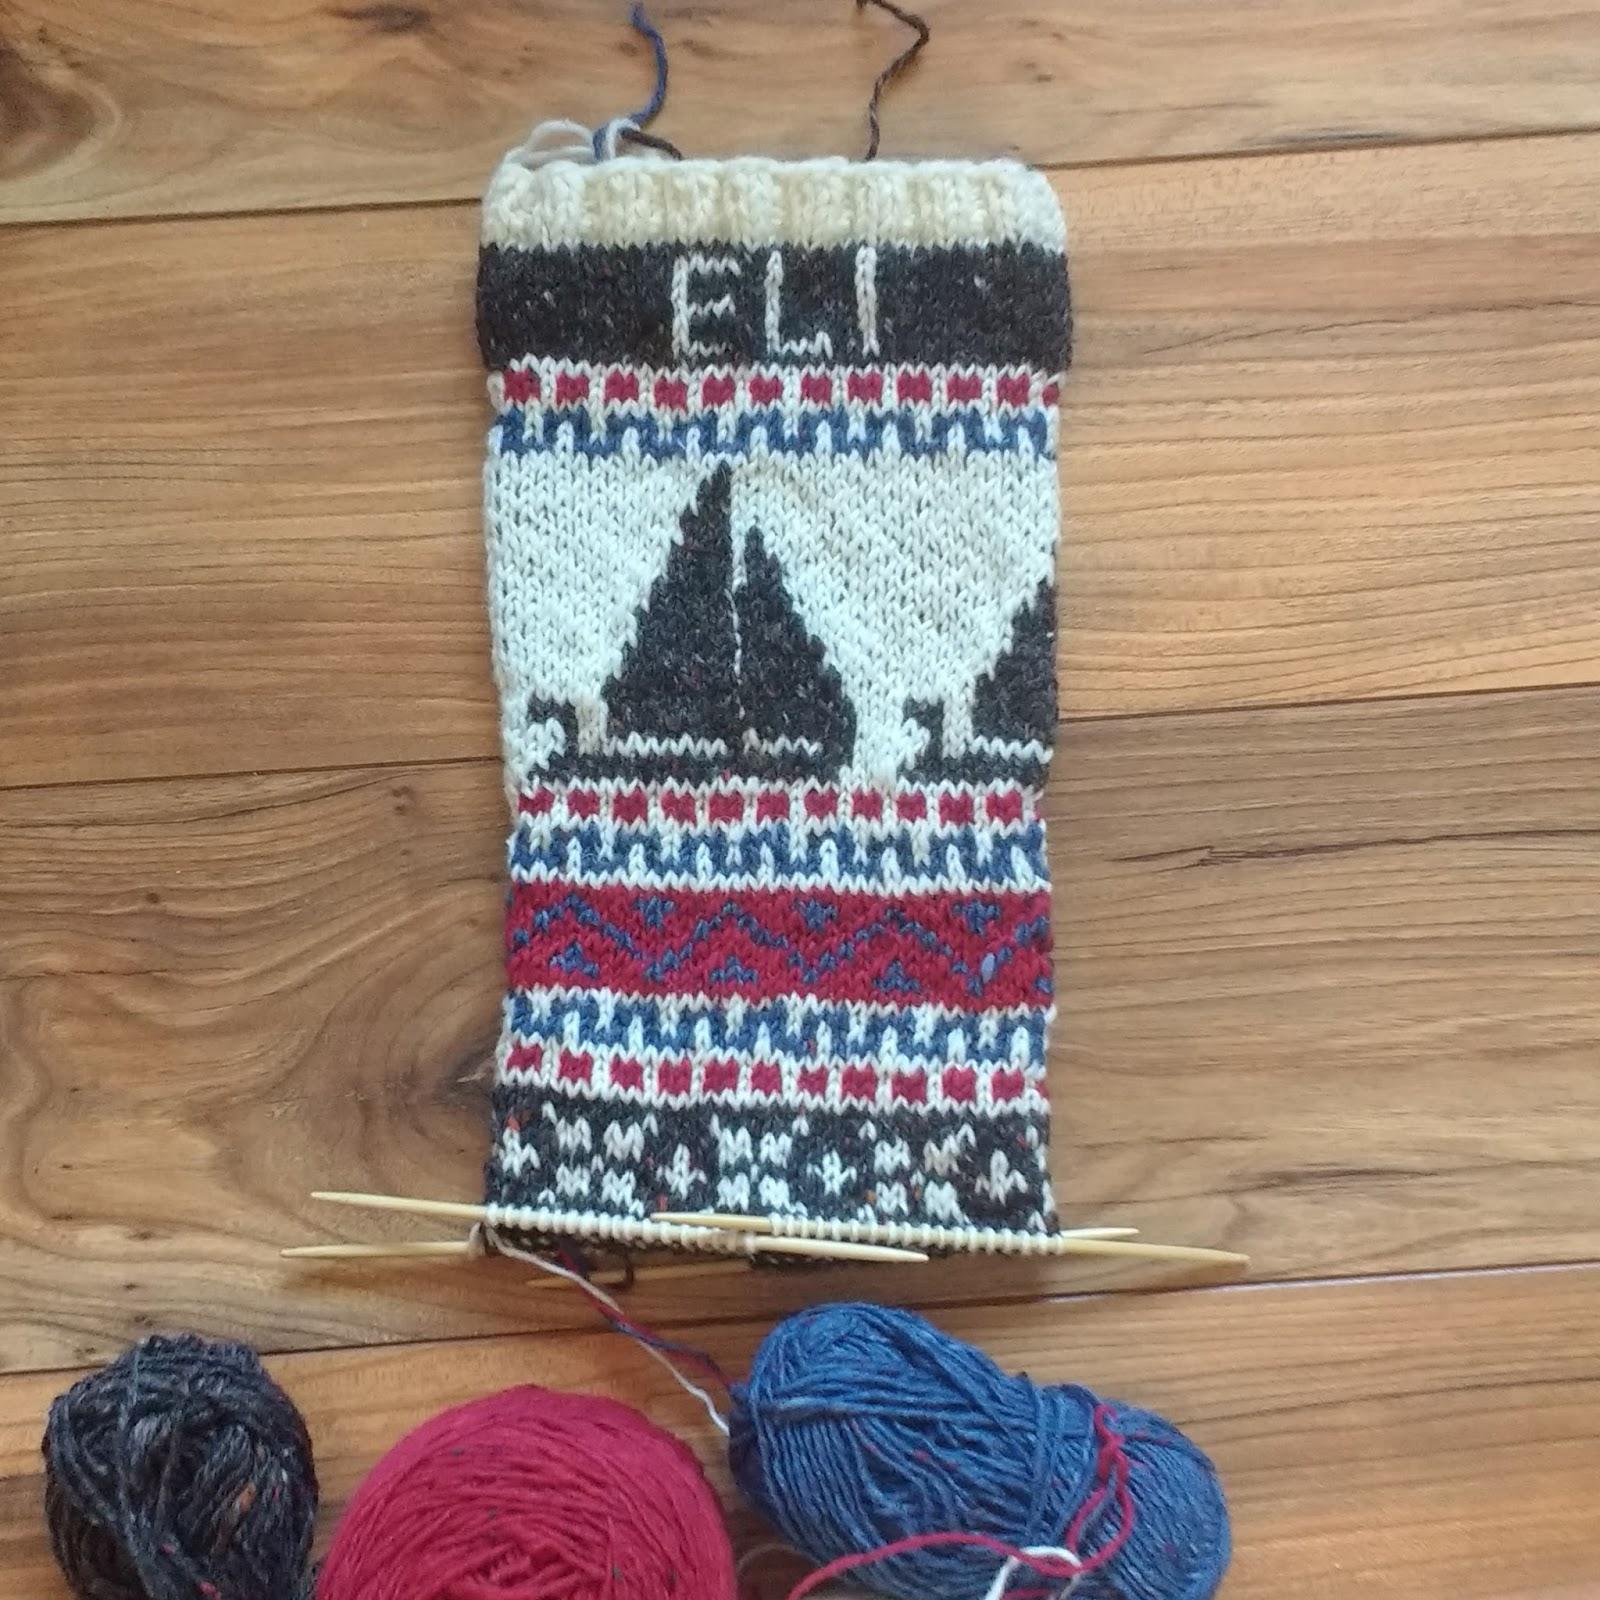 Gigi82Knits: Sail Boats on a Christmas Stocking